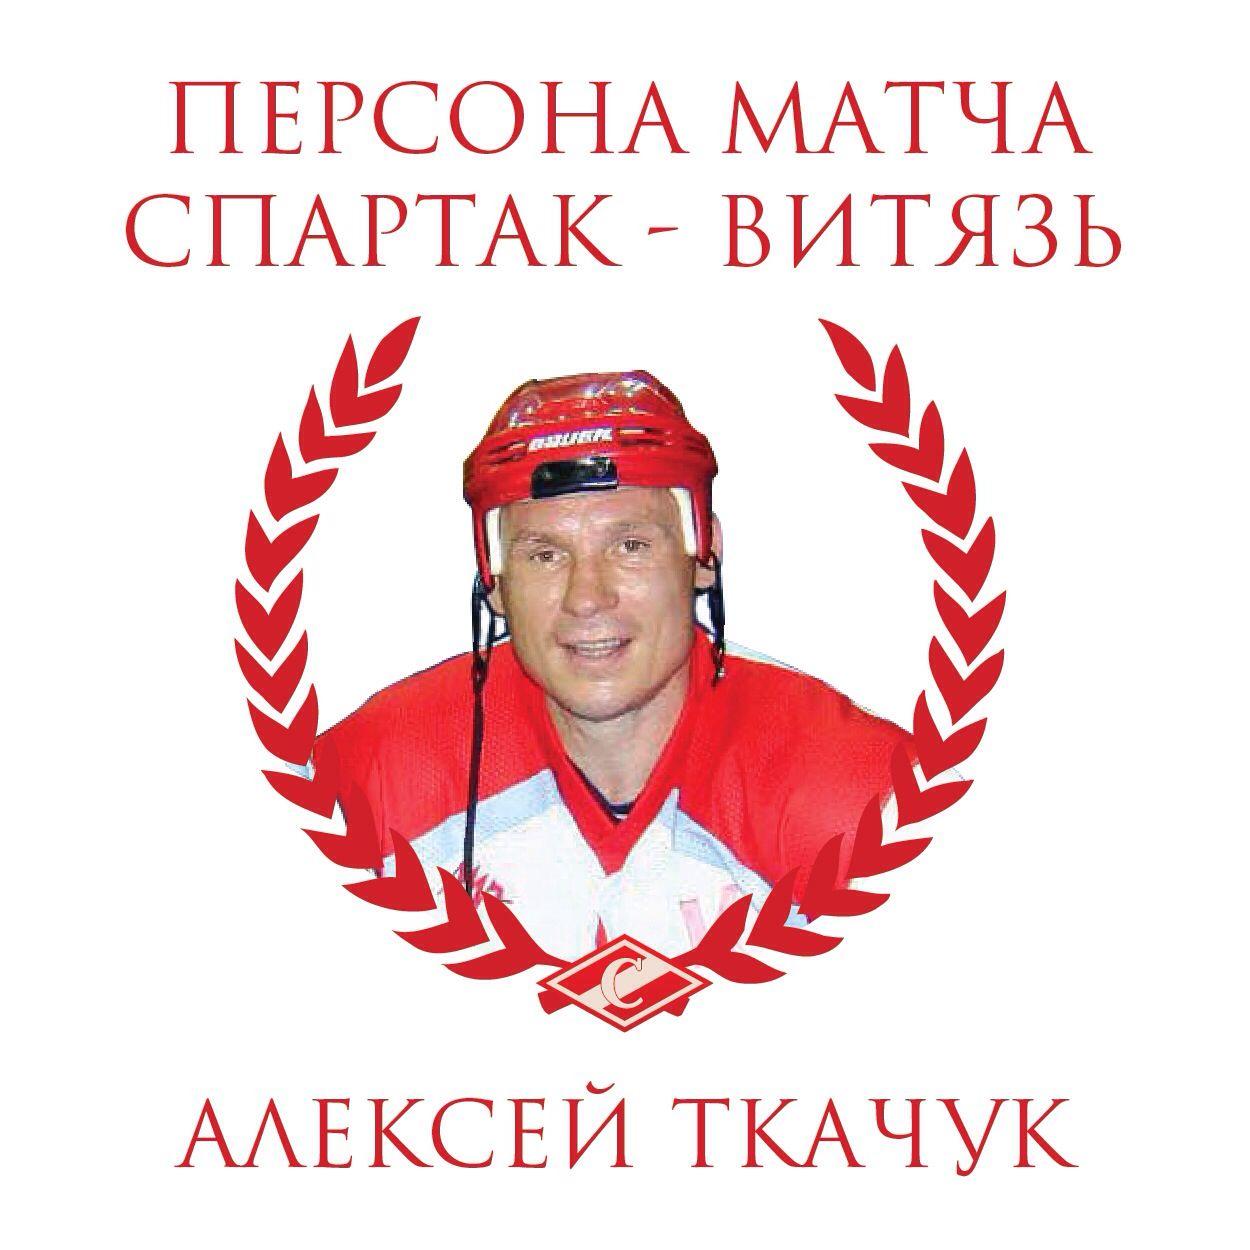 Персона матча Спартак - Витязь.